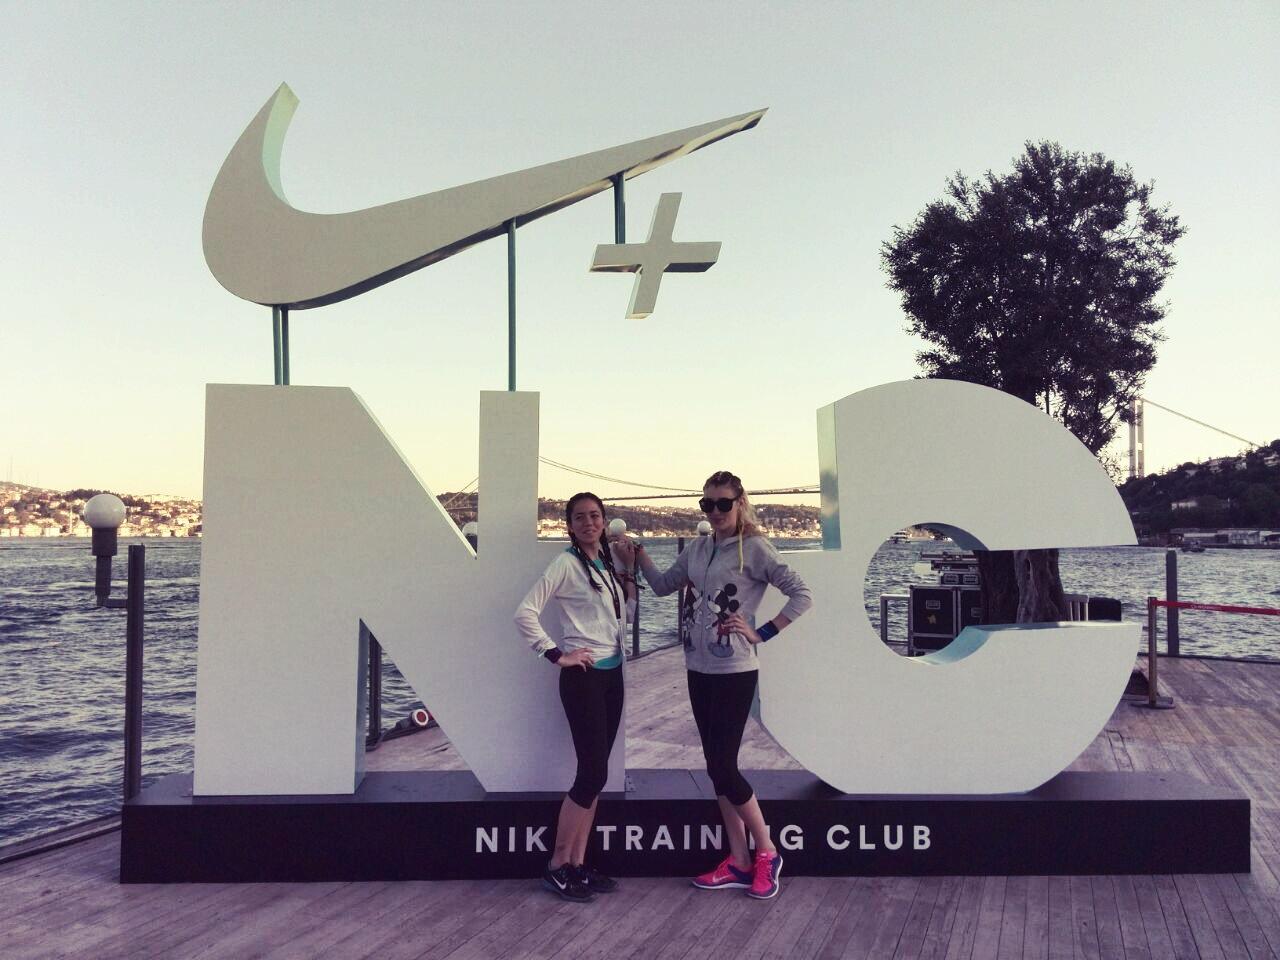 ntctoristanbul-ntc-tour-istanbul-nike-training-club-suada-galatasaray-adası-kendimigectim-burcu-ozcan-14